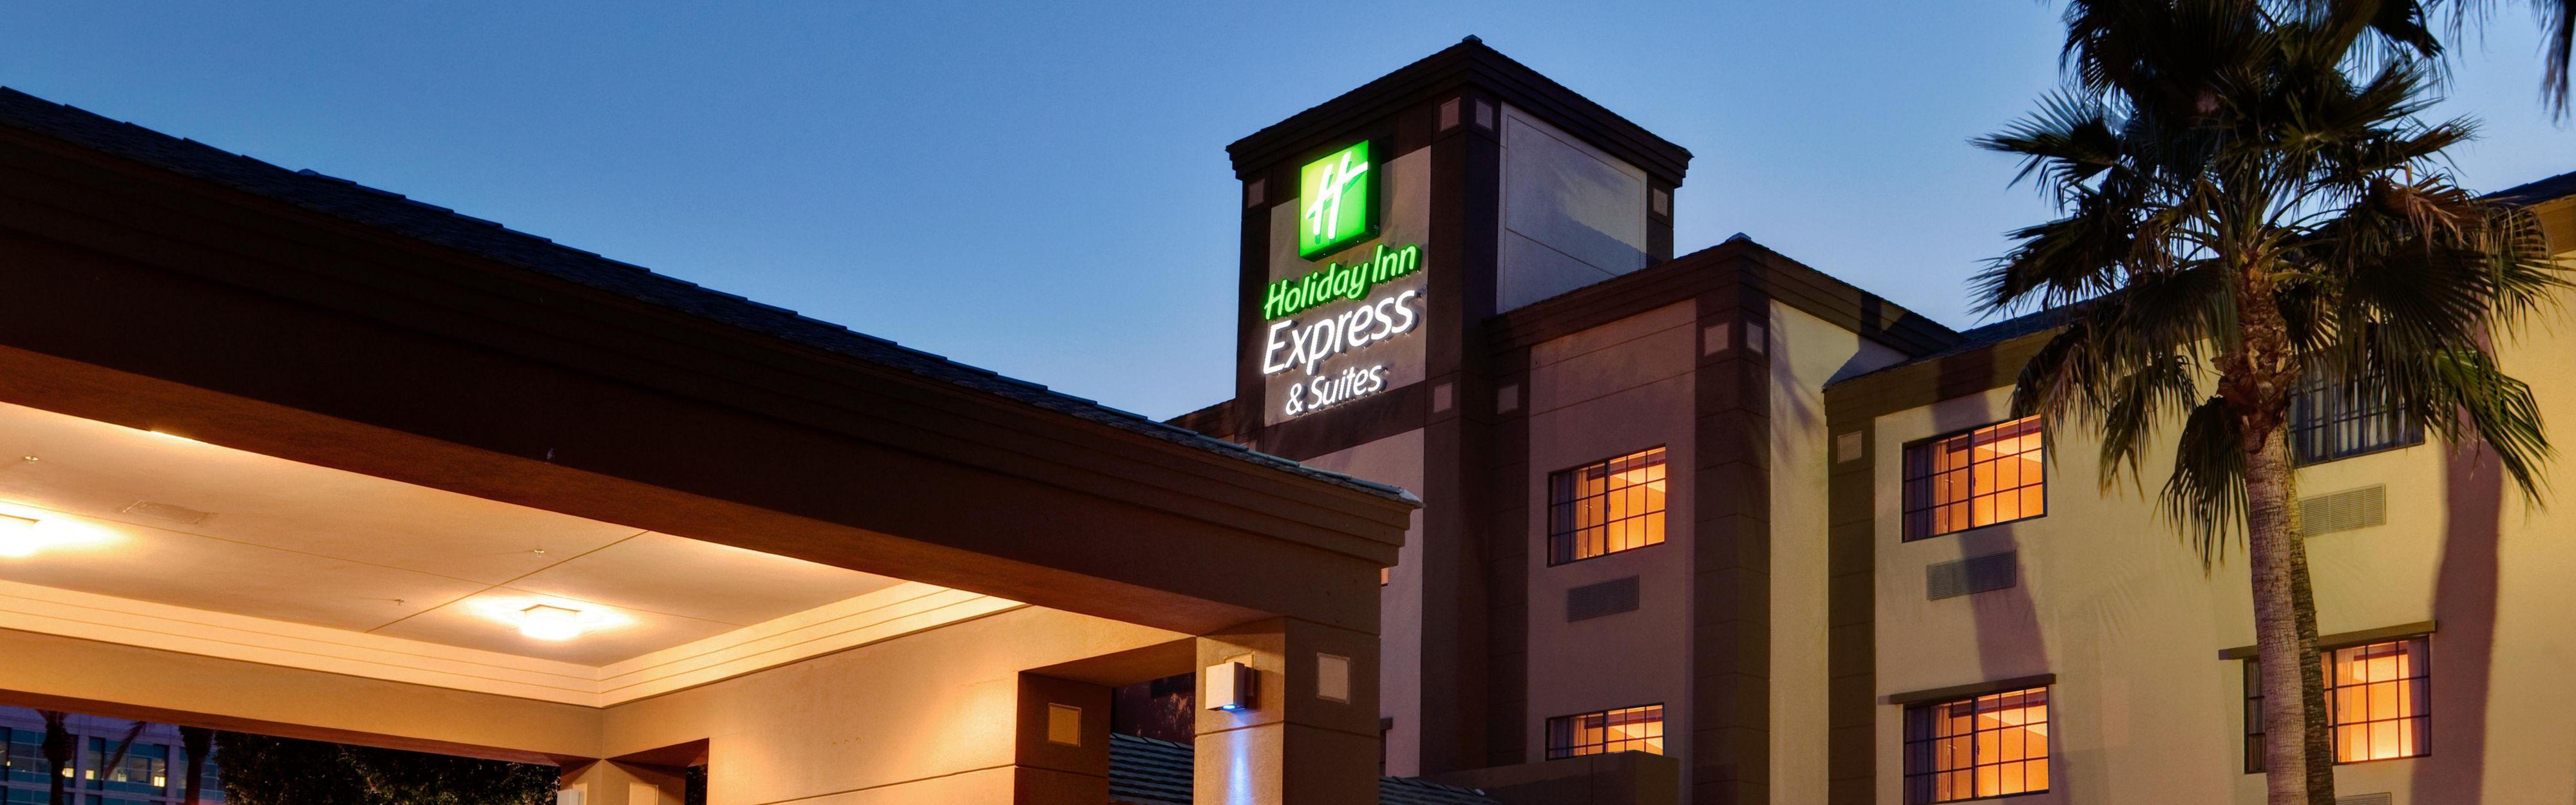 Holiday Inn Express & Suites Phoenix Downtown - Ballpark image 0